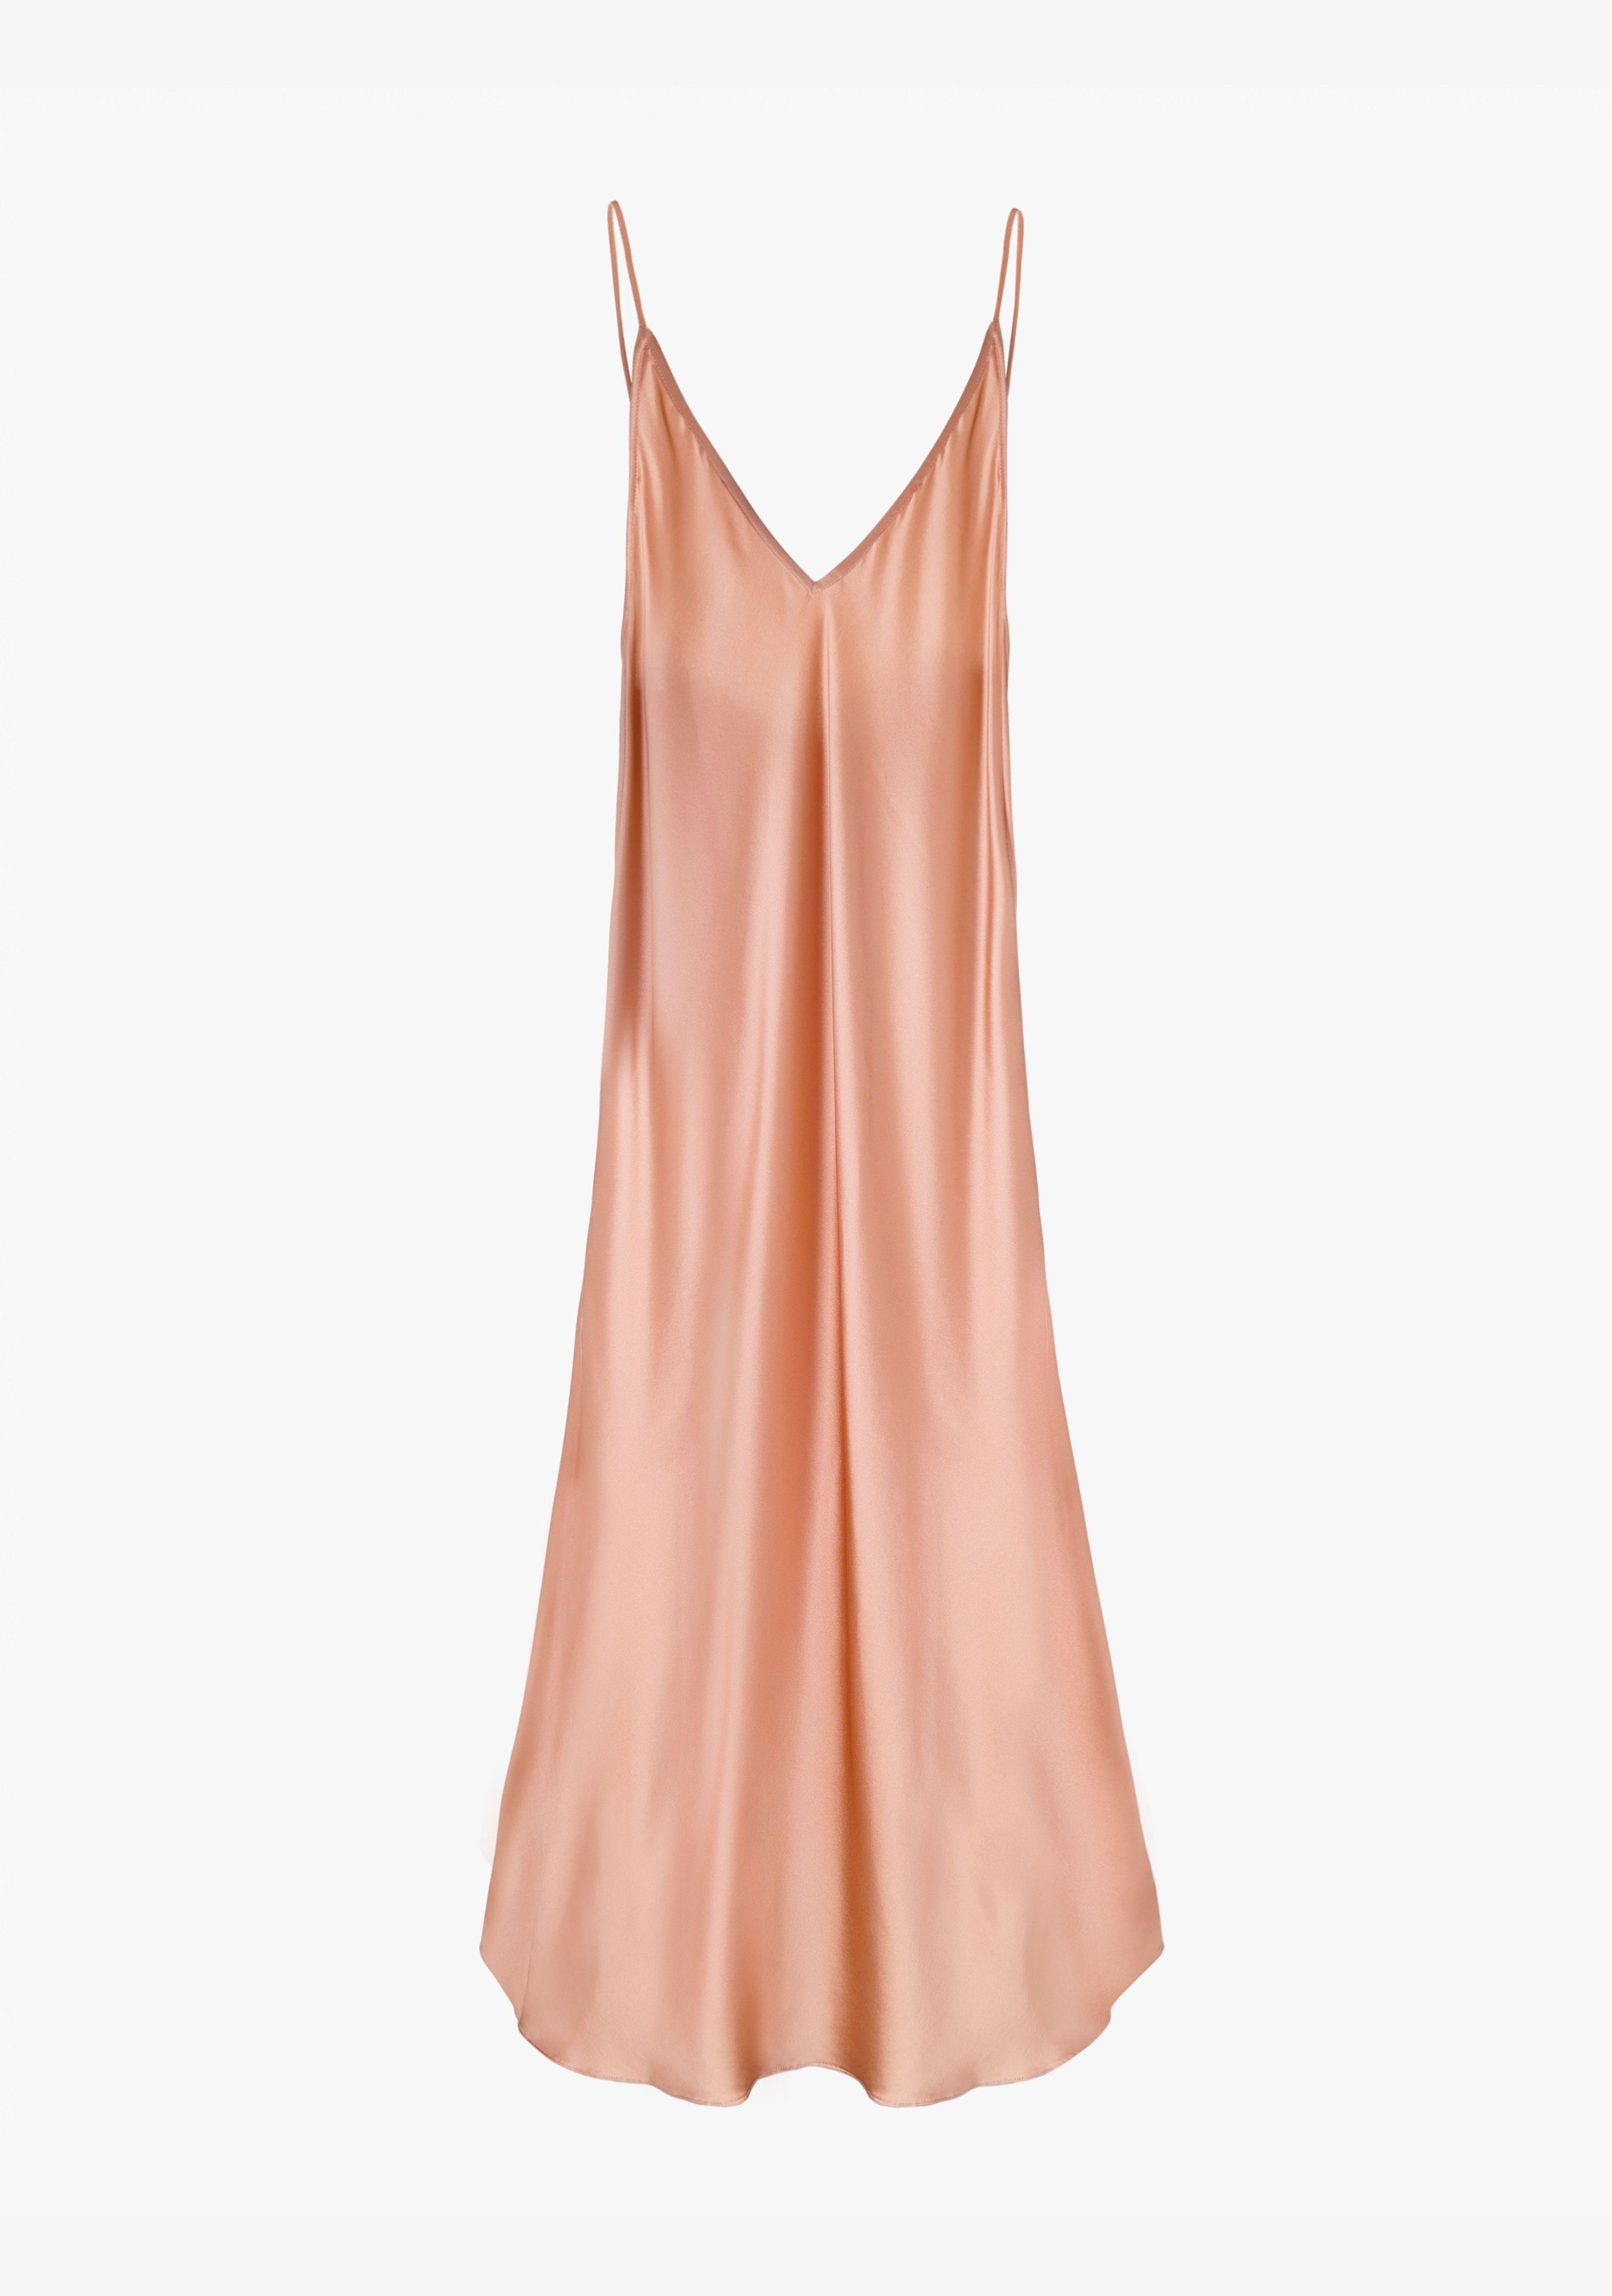 98a403fe62fe0 Carrie Blush Slip Silk Dress | Sewing - Silk | Pinterest | Couture ...